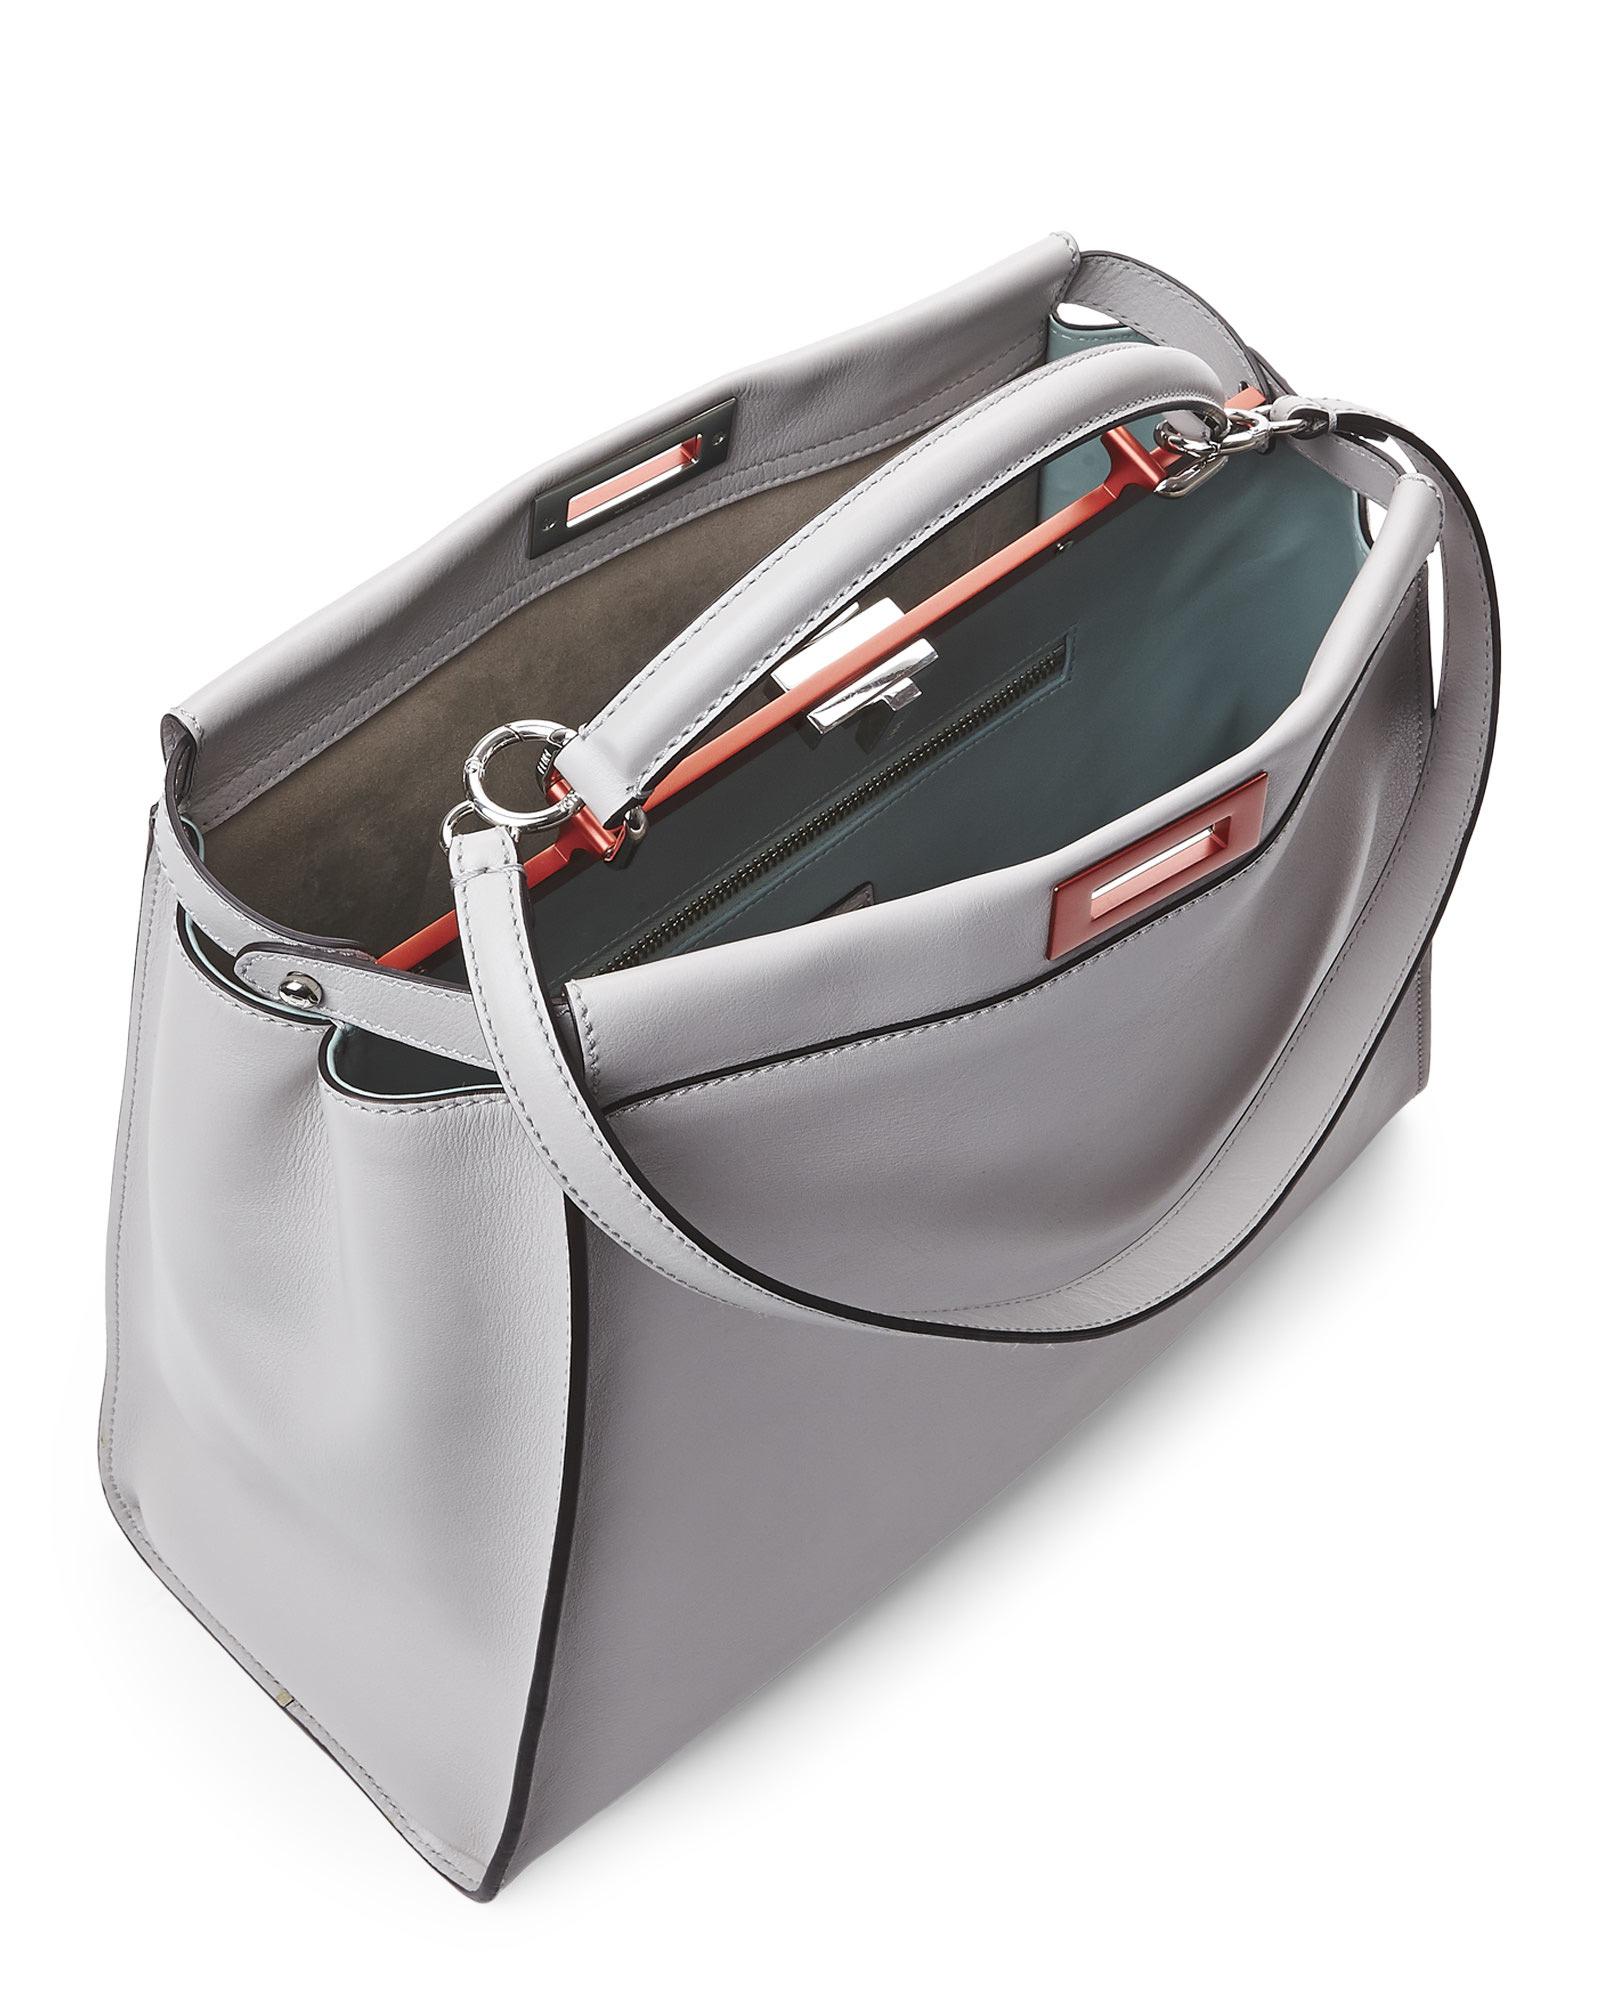 2c4d0d35e9c8 france kan i studs pearl gray leather shoulder bag fendi 3639d 34737  50%  off lyst fendi grey large peekaboo tote in gray 79f96 64571